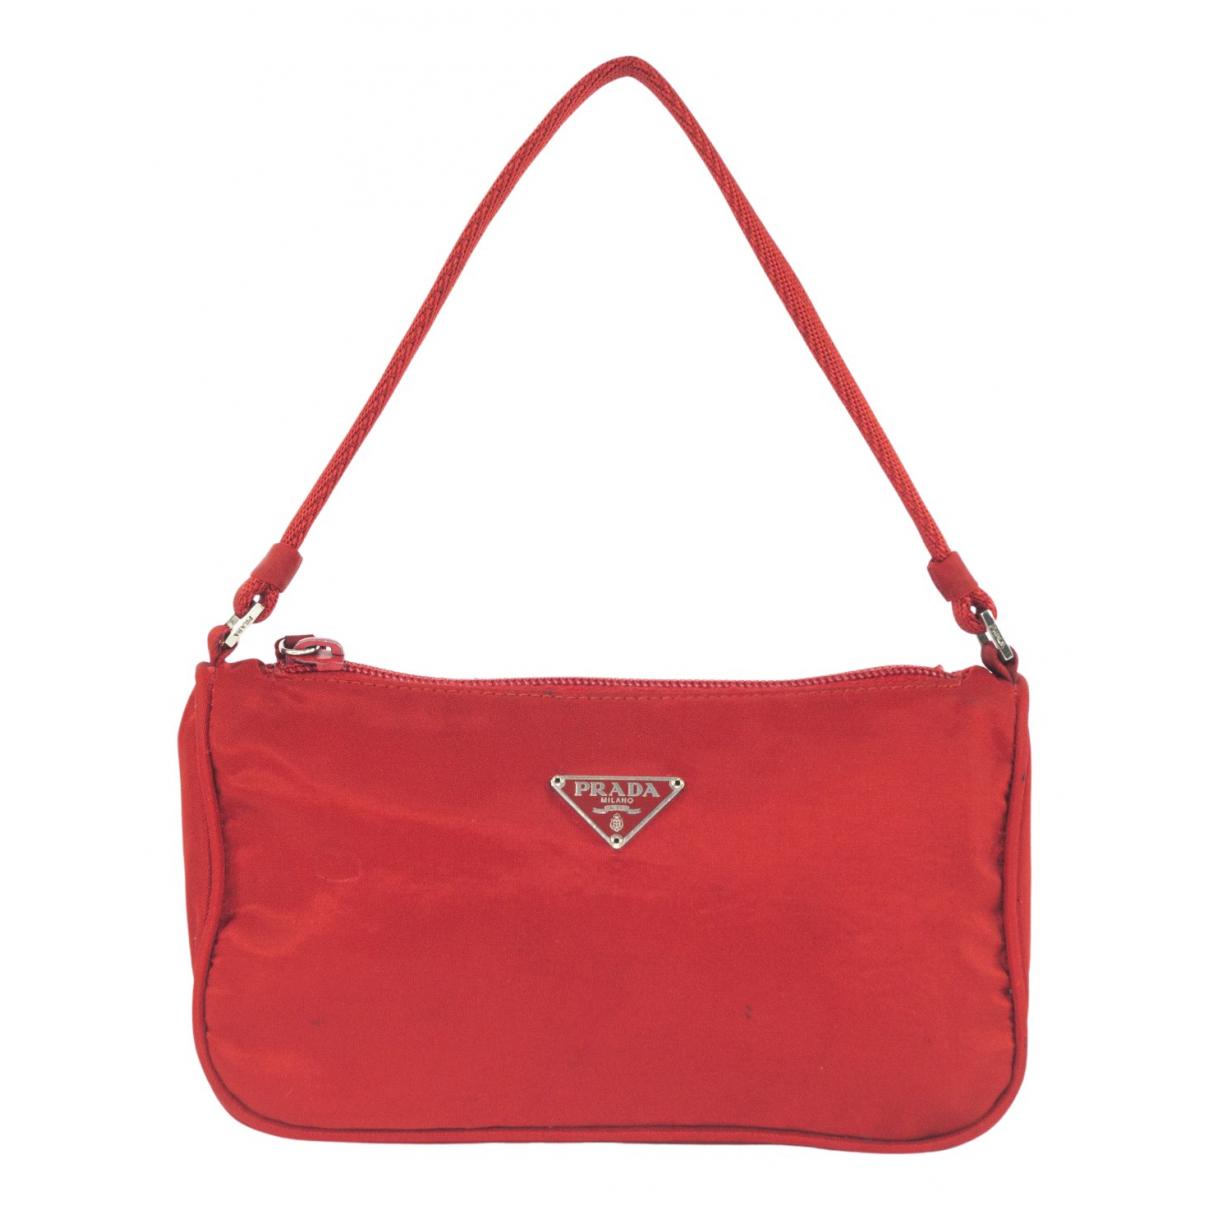 Prada Tessuto  Handtasche in  Rot Synthetik